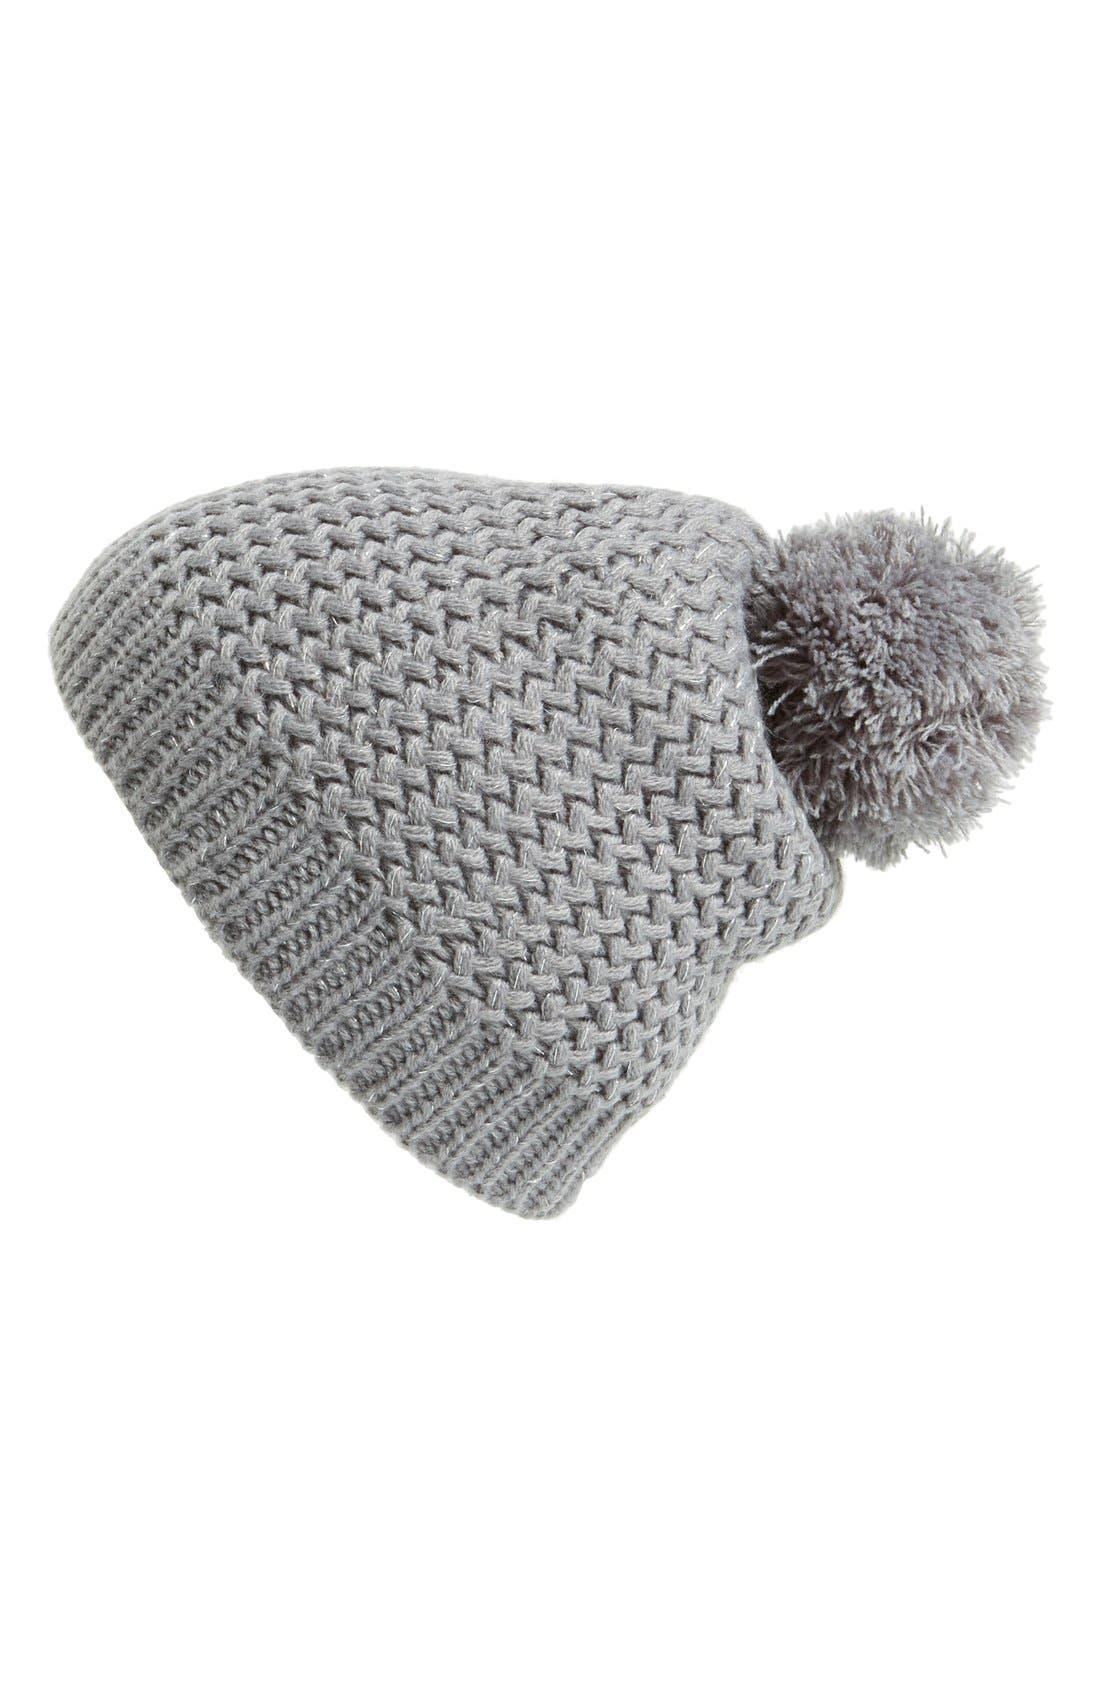 Alternate Image 1 Selected - Capelli of New York Metallic Knit Beanie